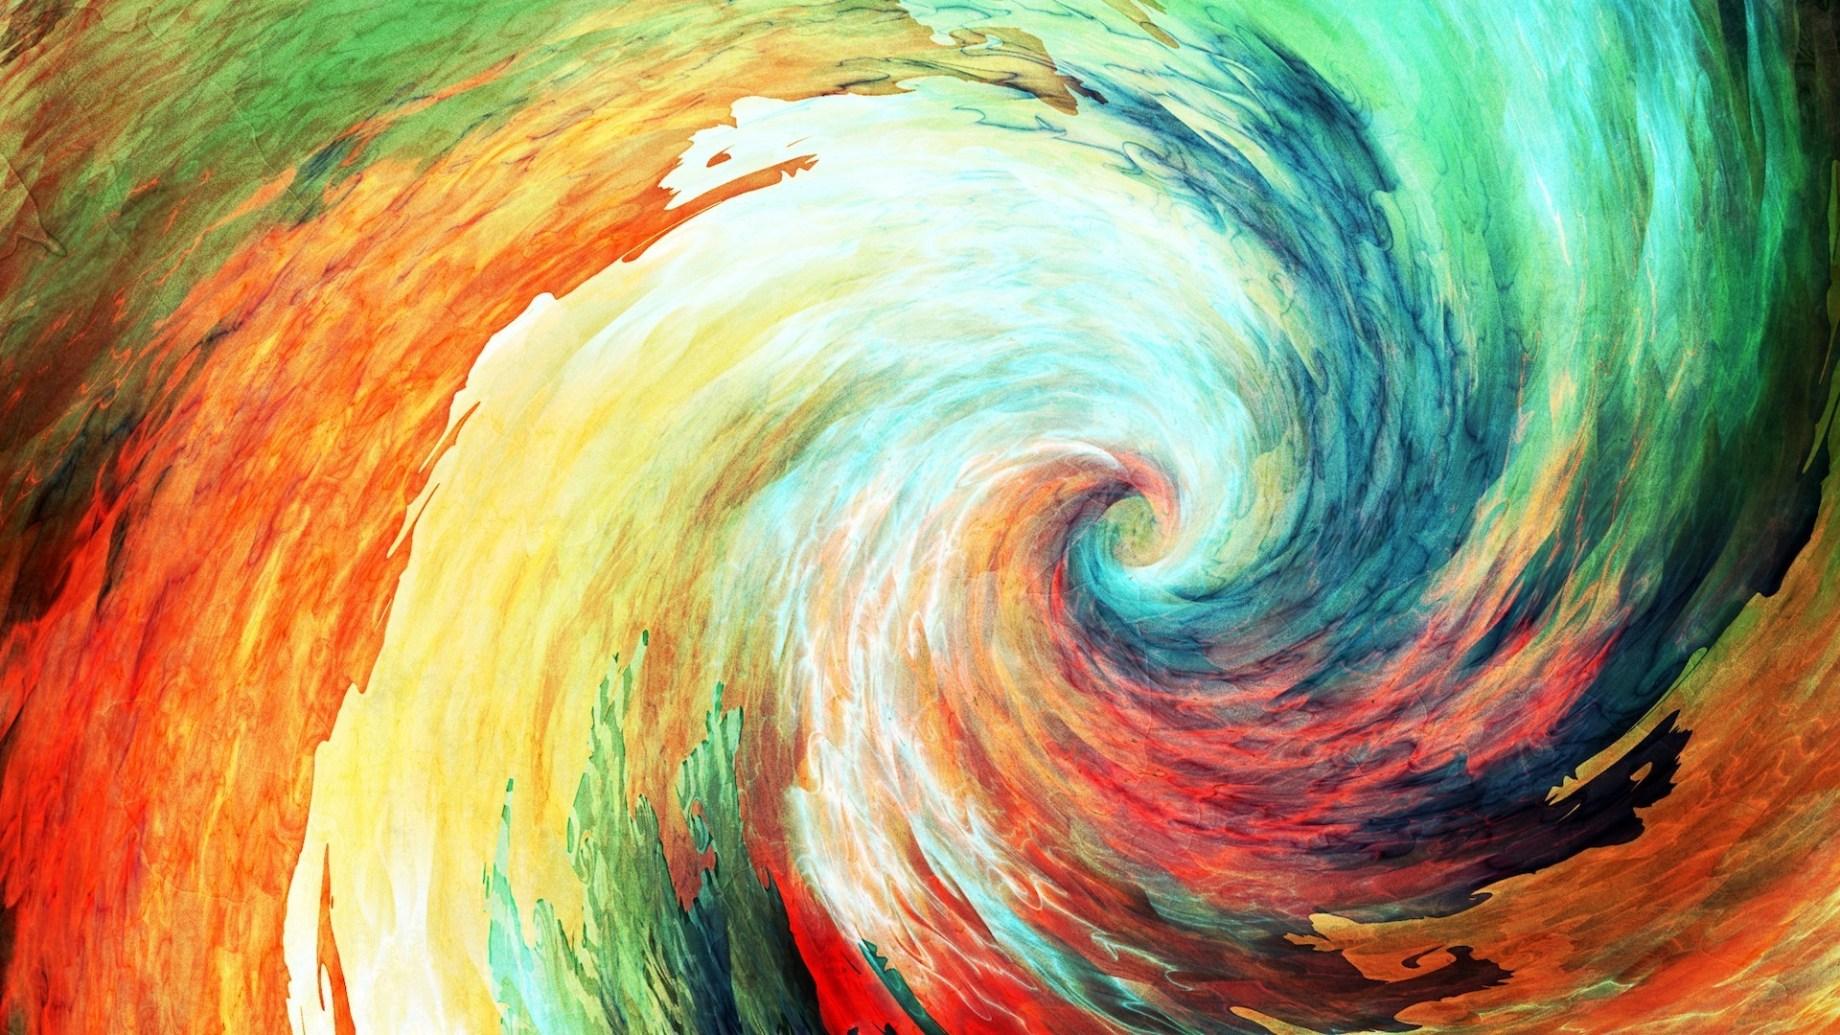 Paintings & Their Effects in Vastu | Vastu Shastra, Vastu for Home, Vastu Shastra Tips, home ...